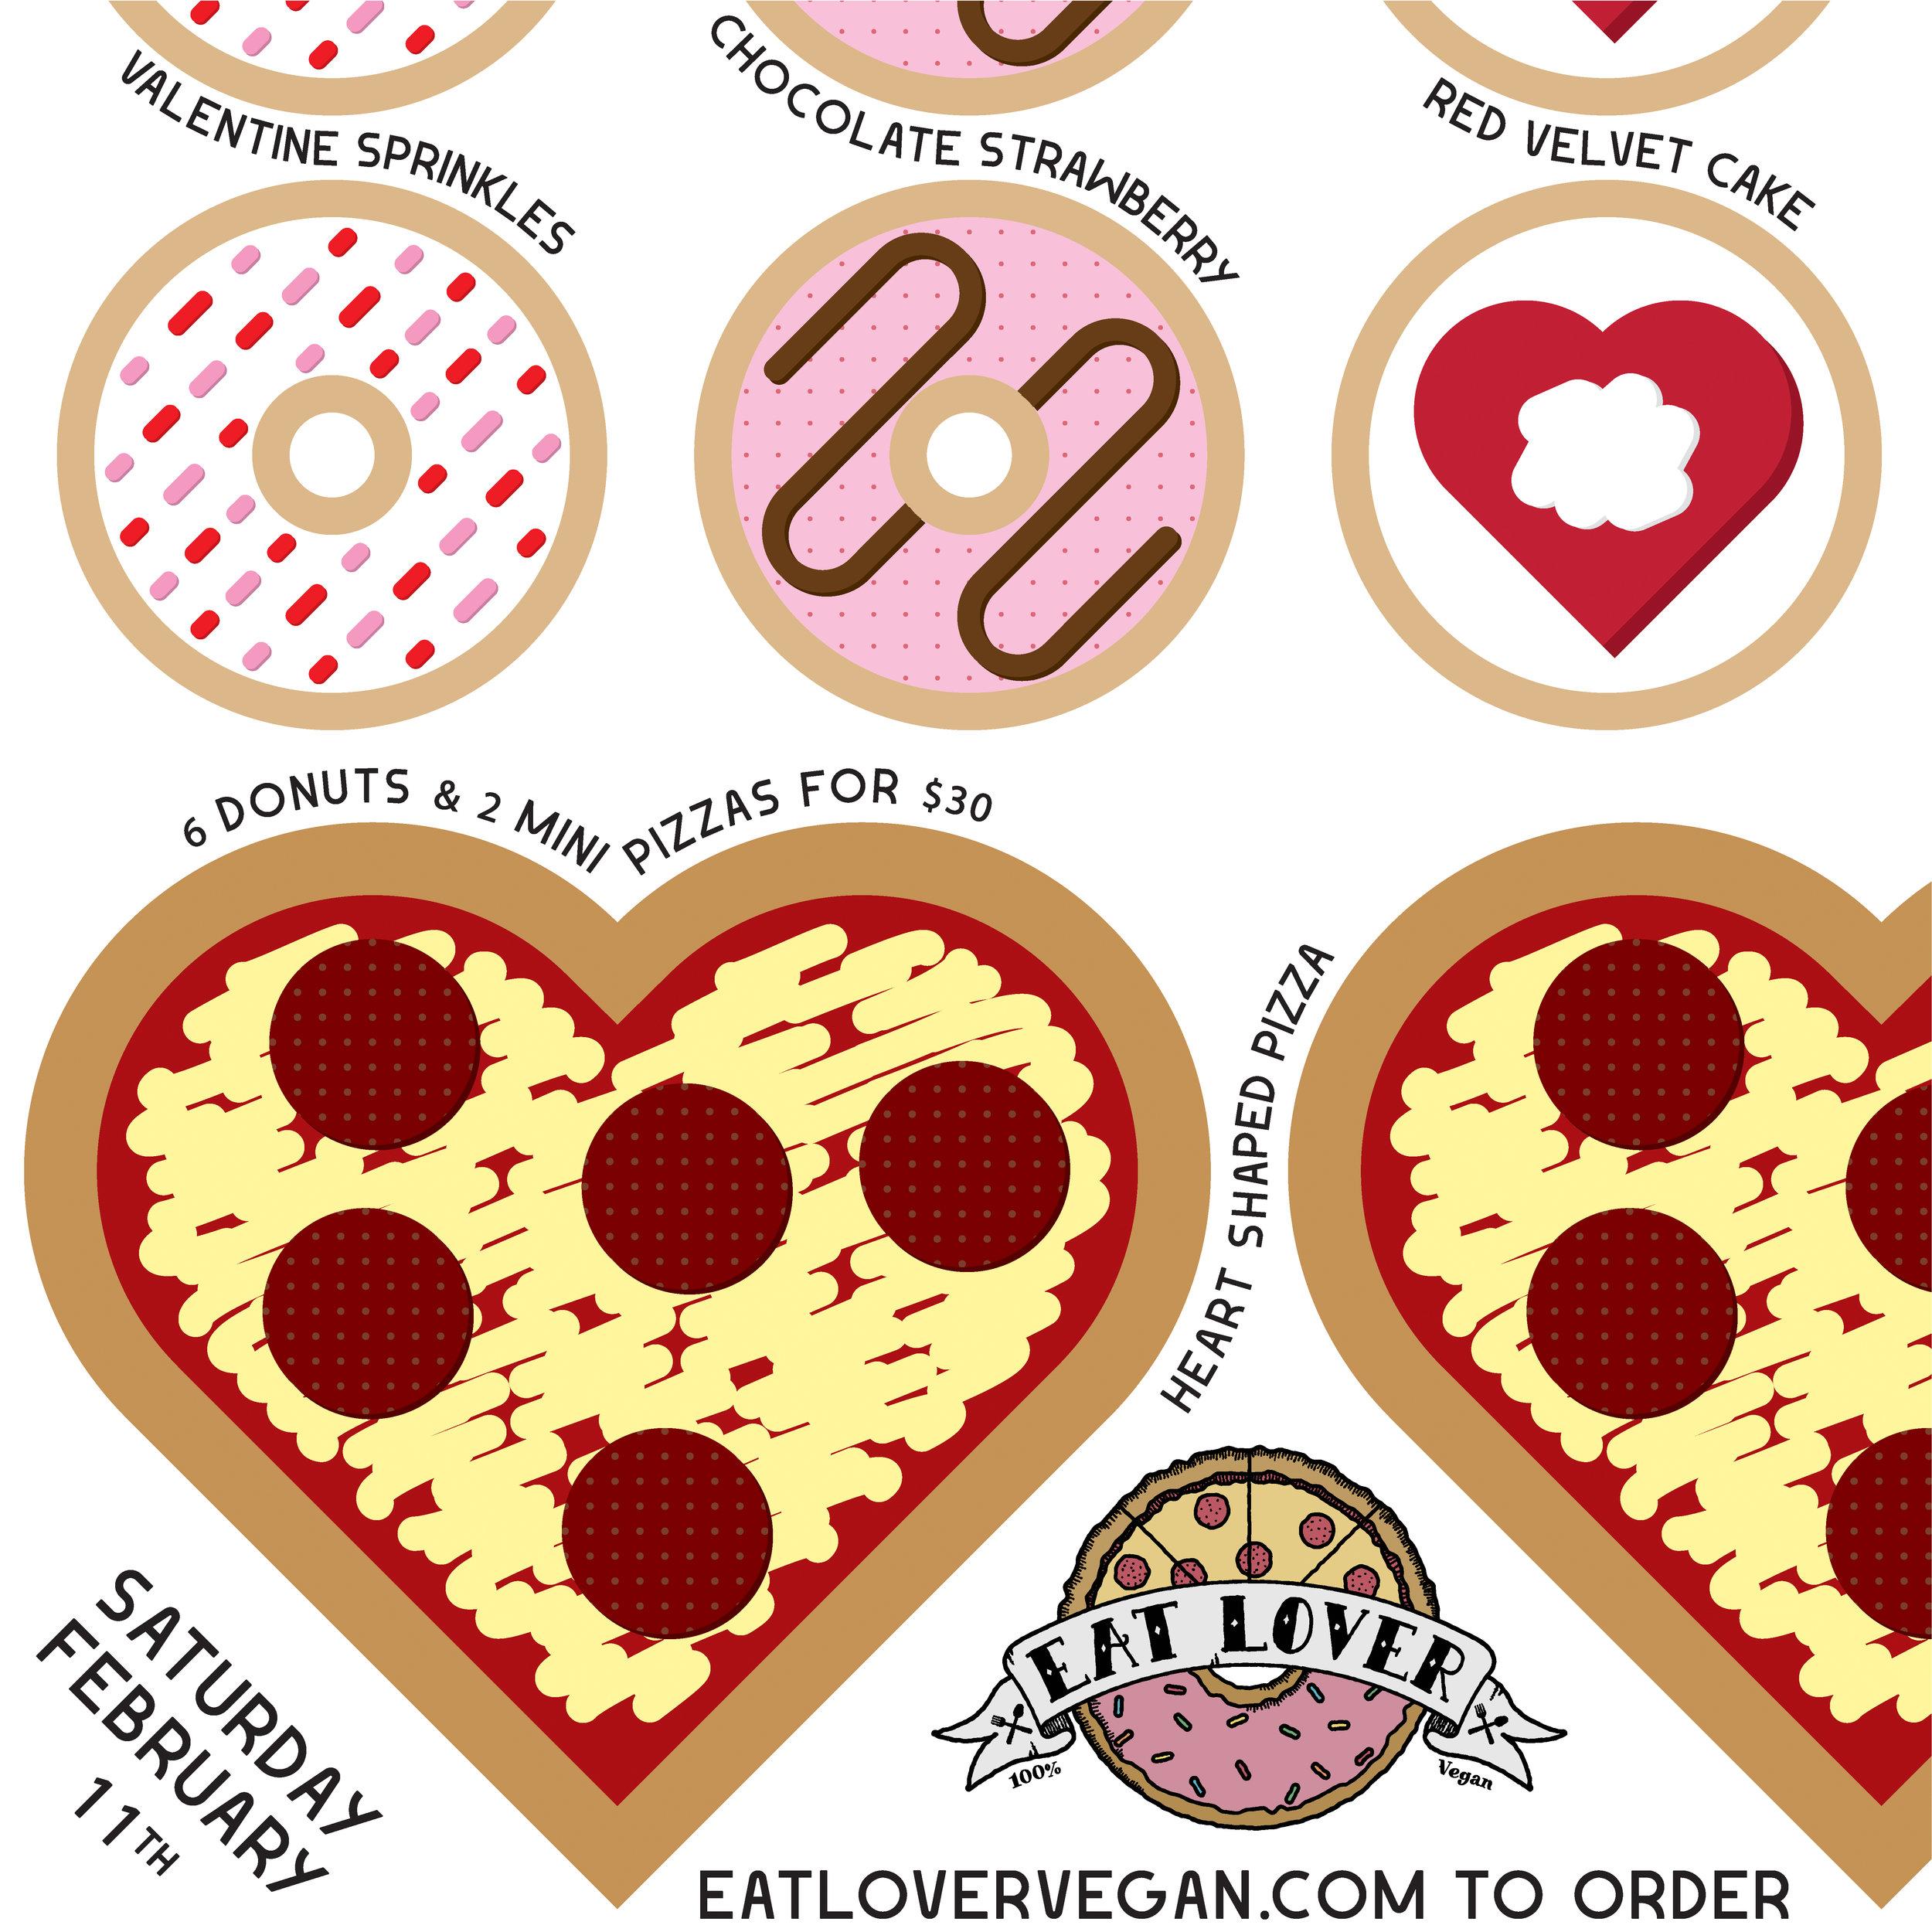 eat lover - VALENTINES AD.jpg